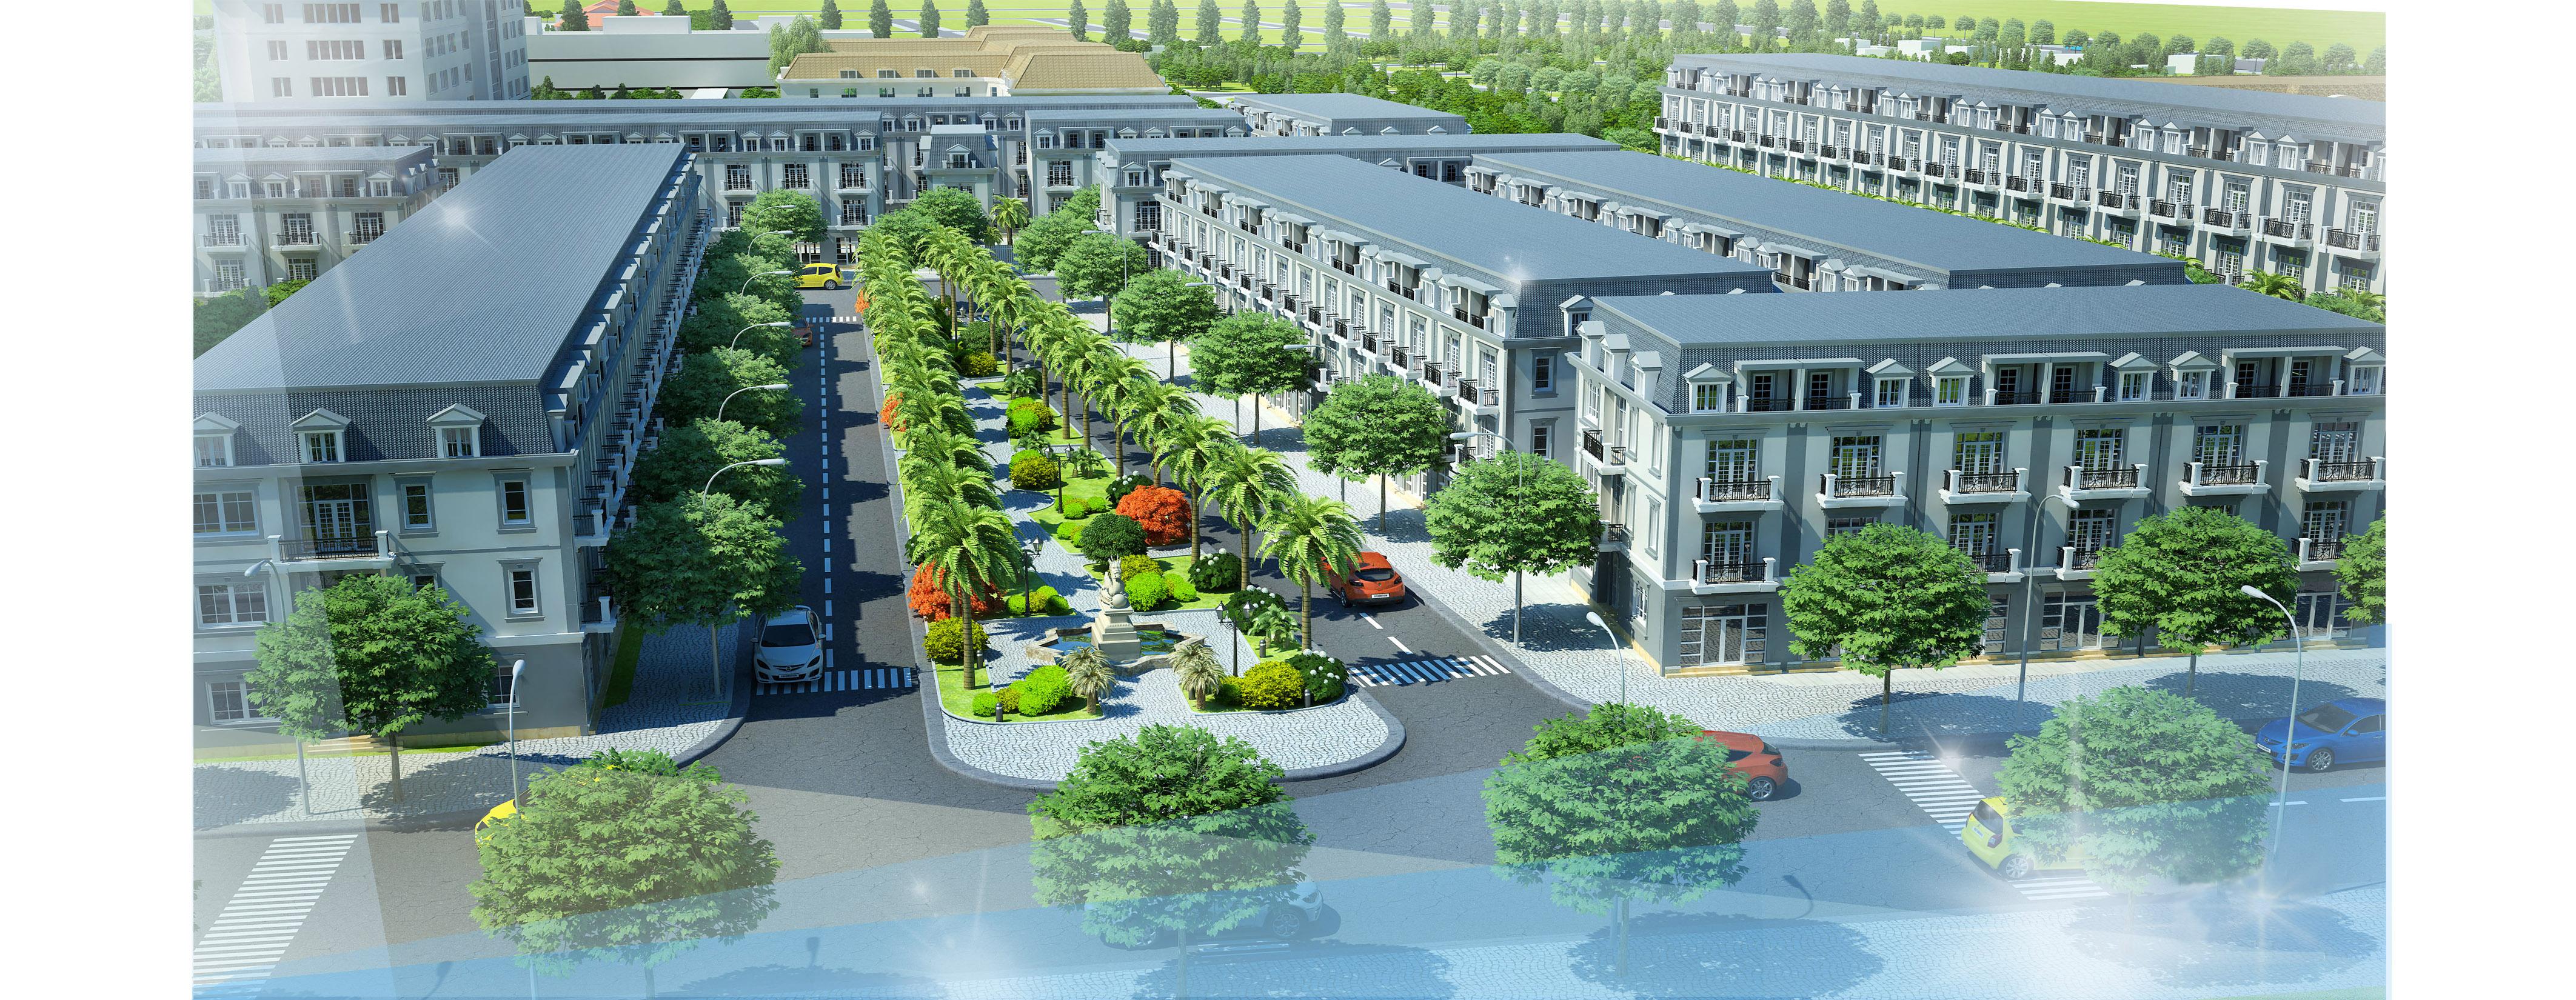 http://newlandgroup.vn/khu-dan-cu-thanh-binh